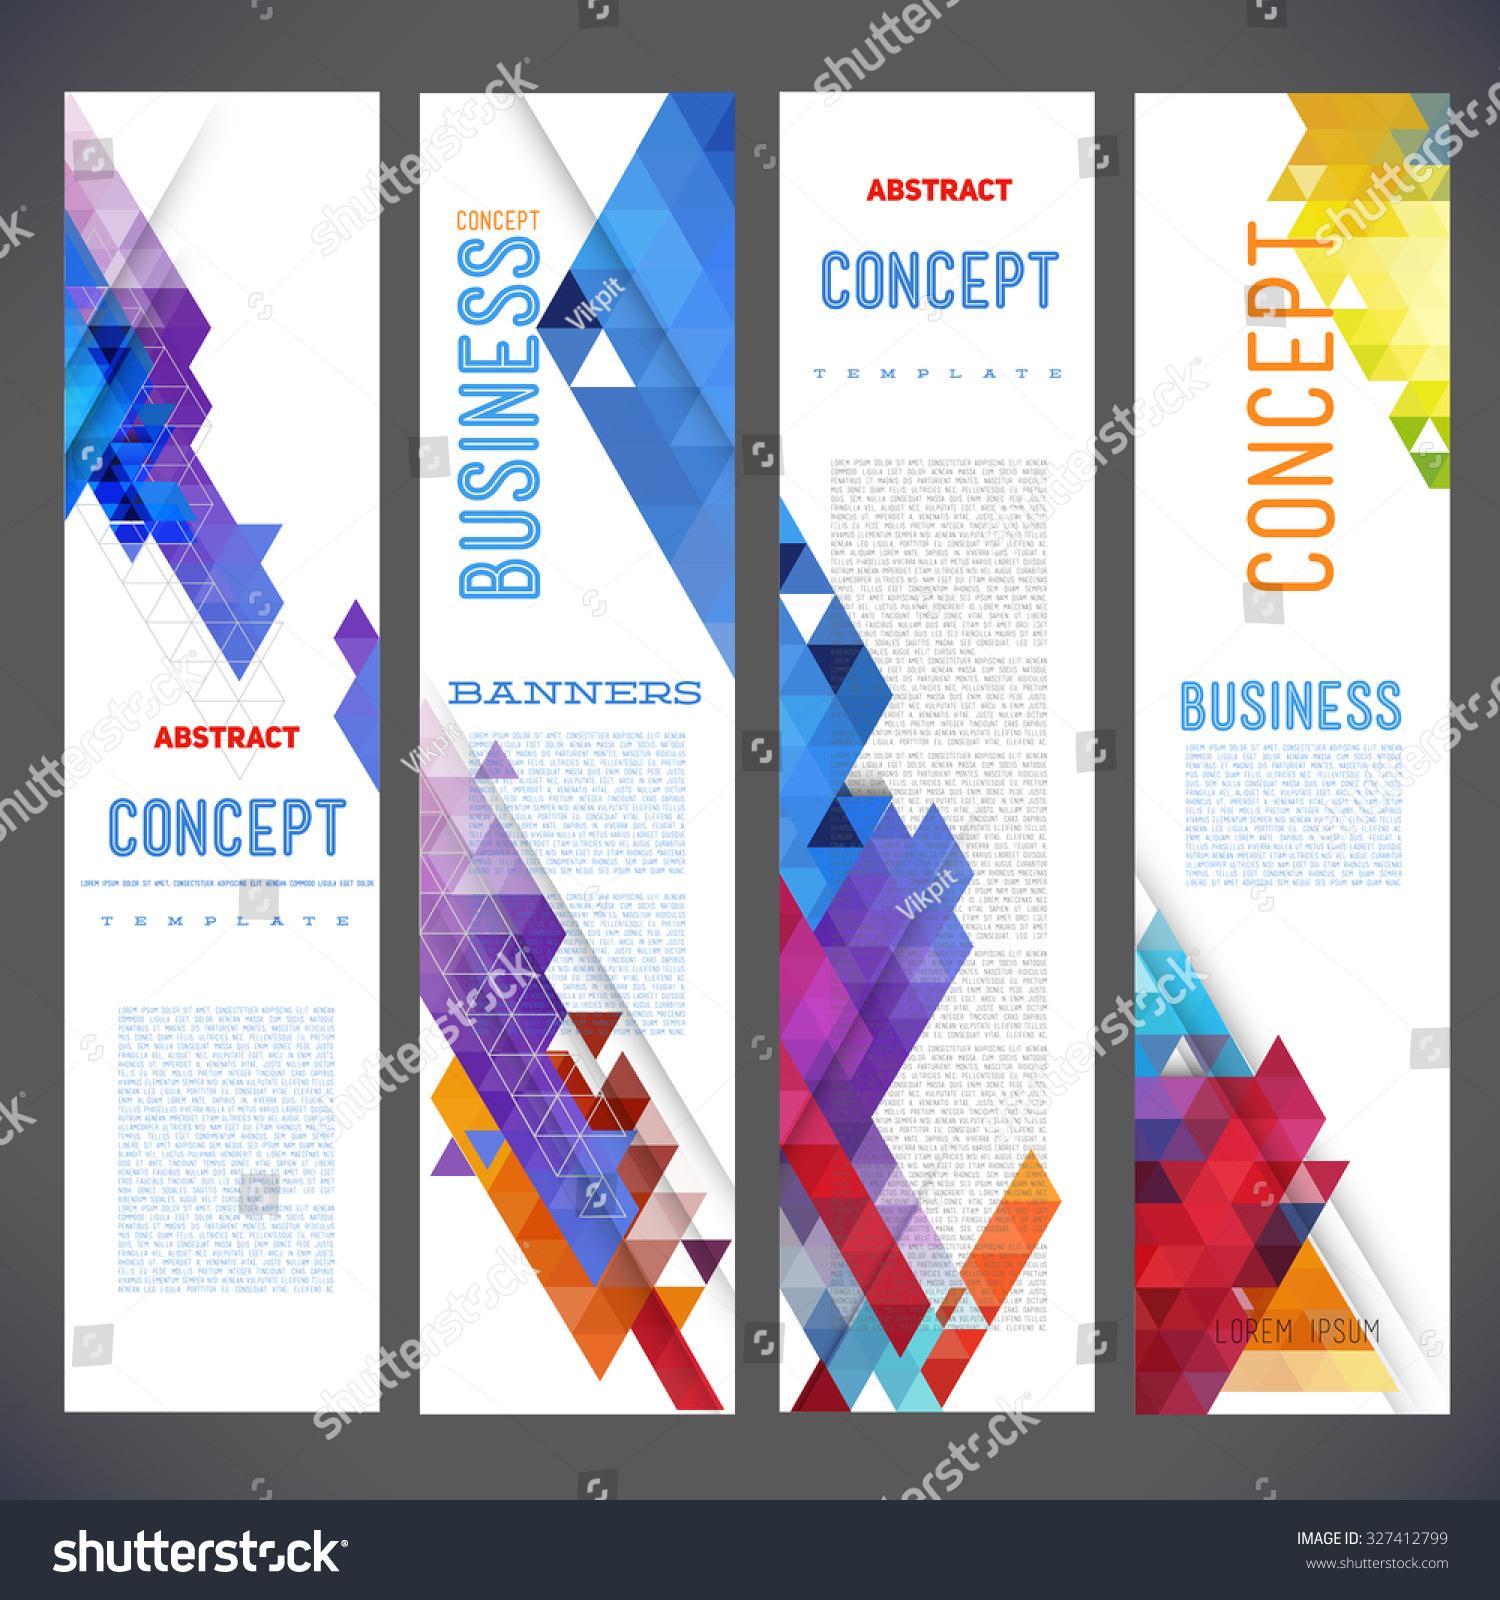 Abstract Design Banners Vector Template Design Stock Vector ...